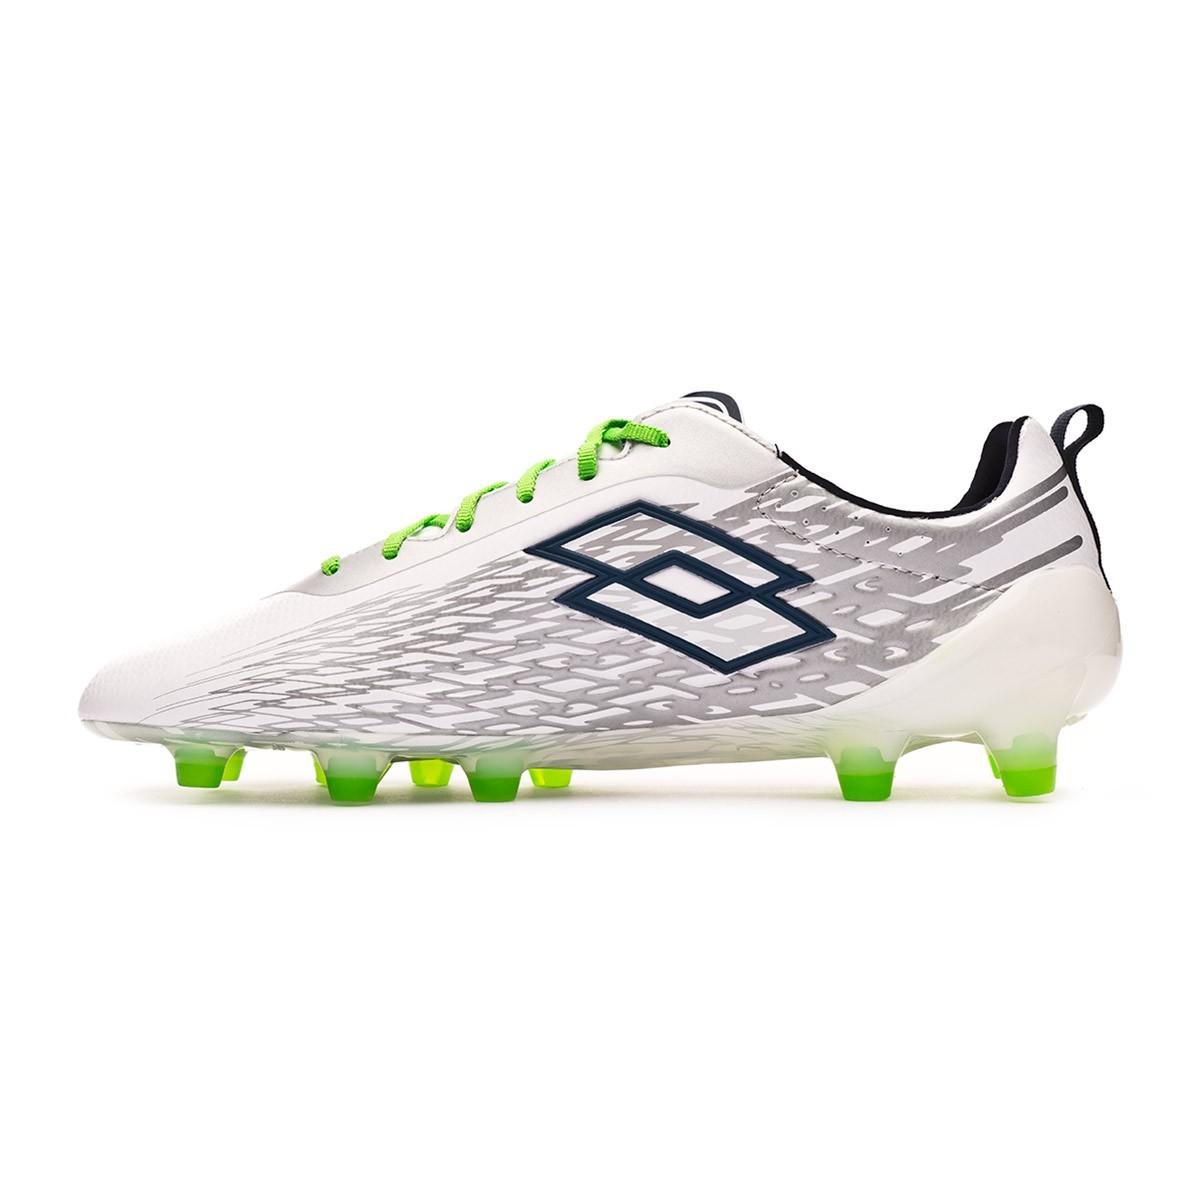 Football Boots Lotto Solista 200 FG